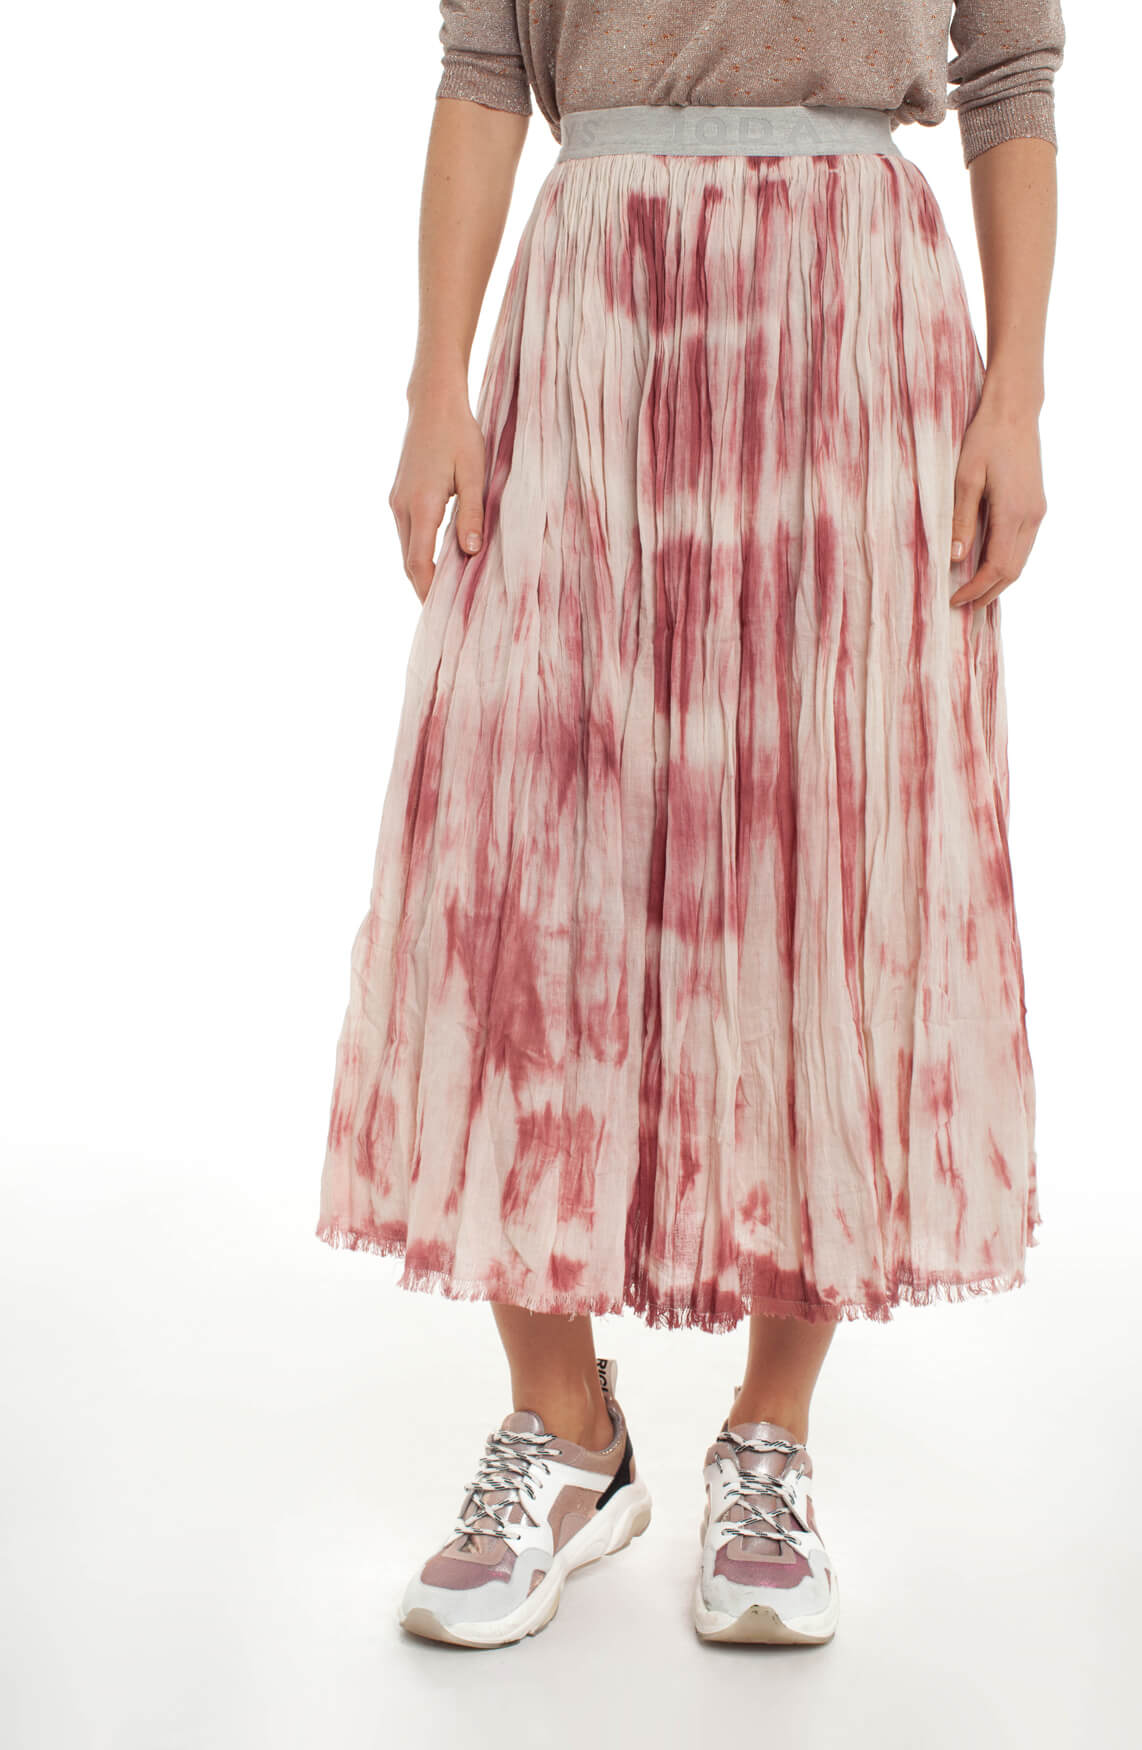 10 Days Dames Garment dye plooirok roze